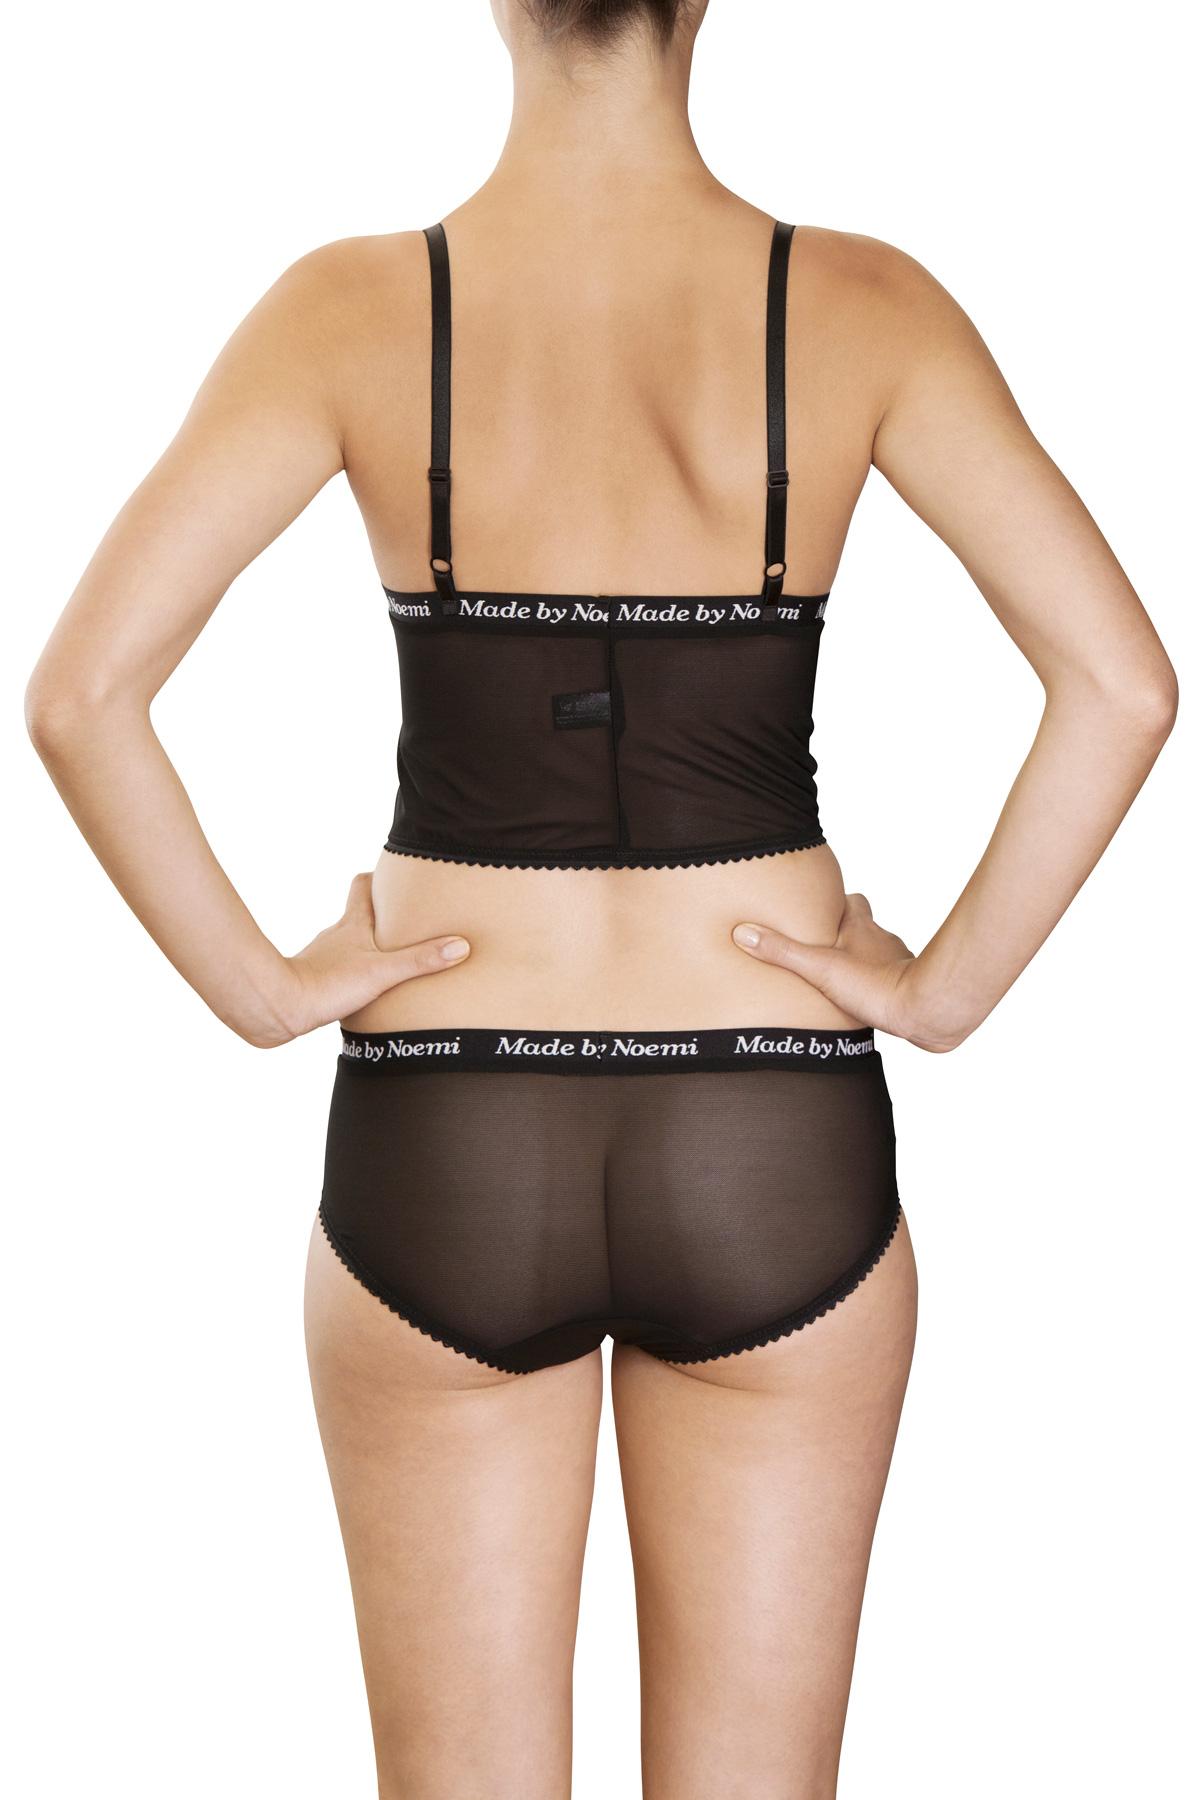 afc34c78de sheerpower bustier panties-low black back